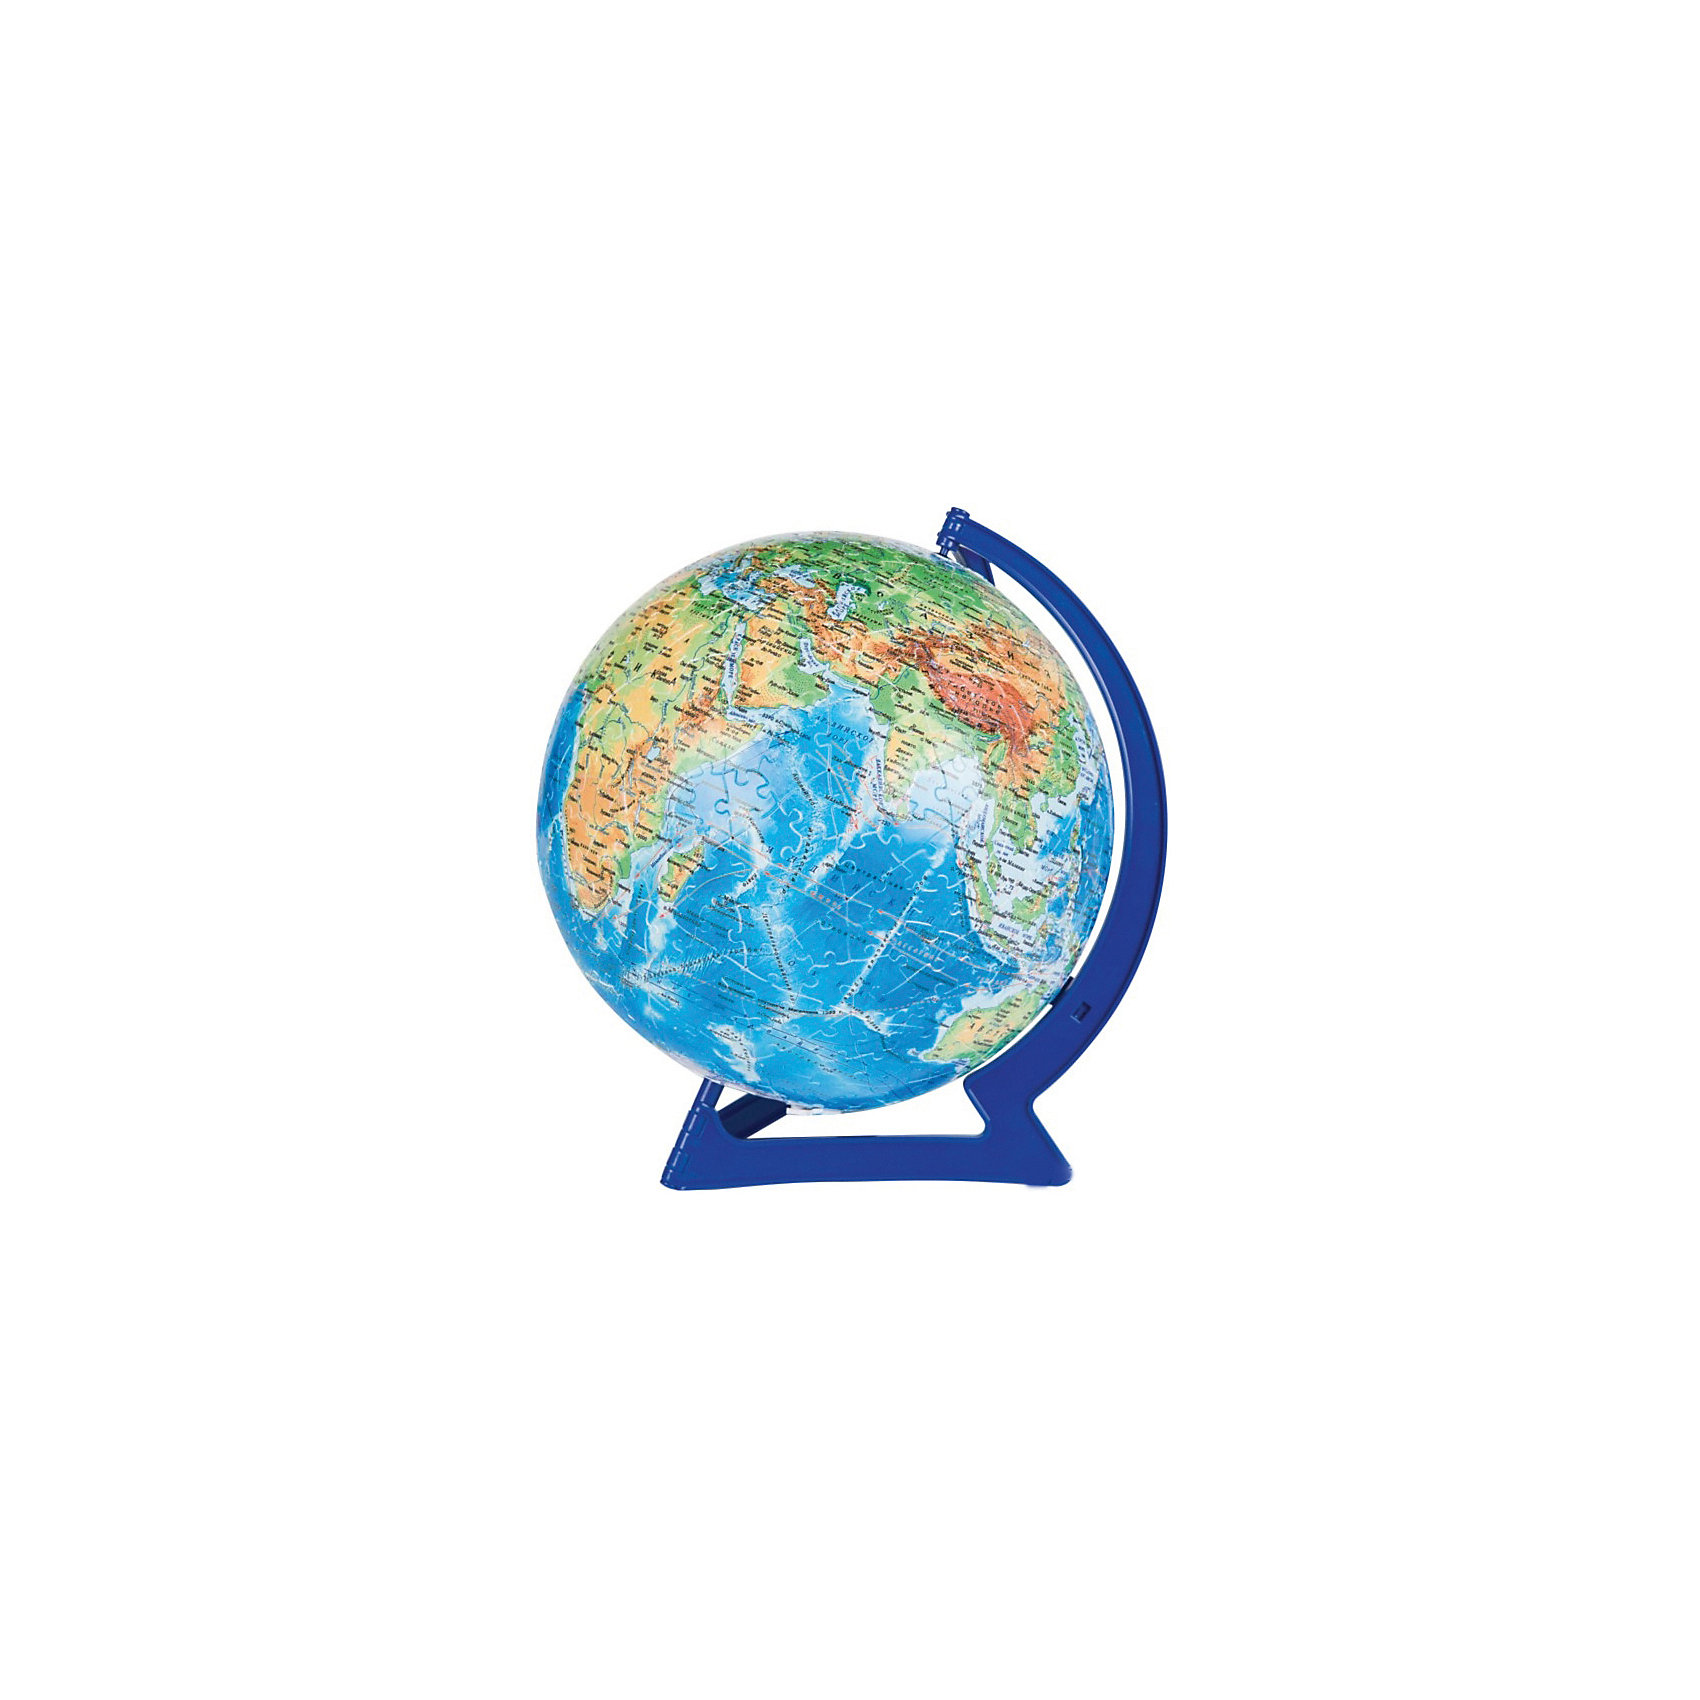 Пазл-шар  Физическая карта мира, 540 деталейПазлы-шары<br><br><br>Ширина мм: 275<br>Глубина мм: 275<br>Высота мм: 75<br>Вес г: 850<br>Возраст от месяцев: 36<br>Возраст до месяцев: 2147483647<br>Пол: Унисекс<br>Возраст: Детский<br>Количество деталей: 540<br>SKU: 5346235